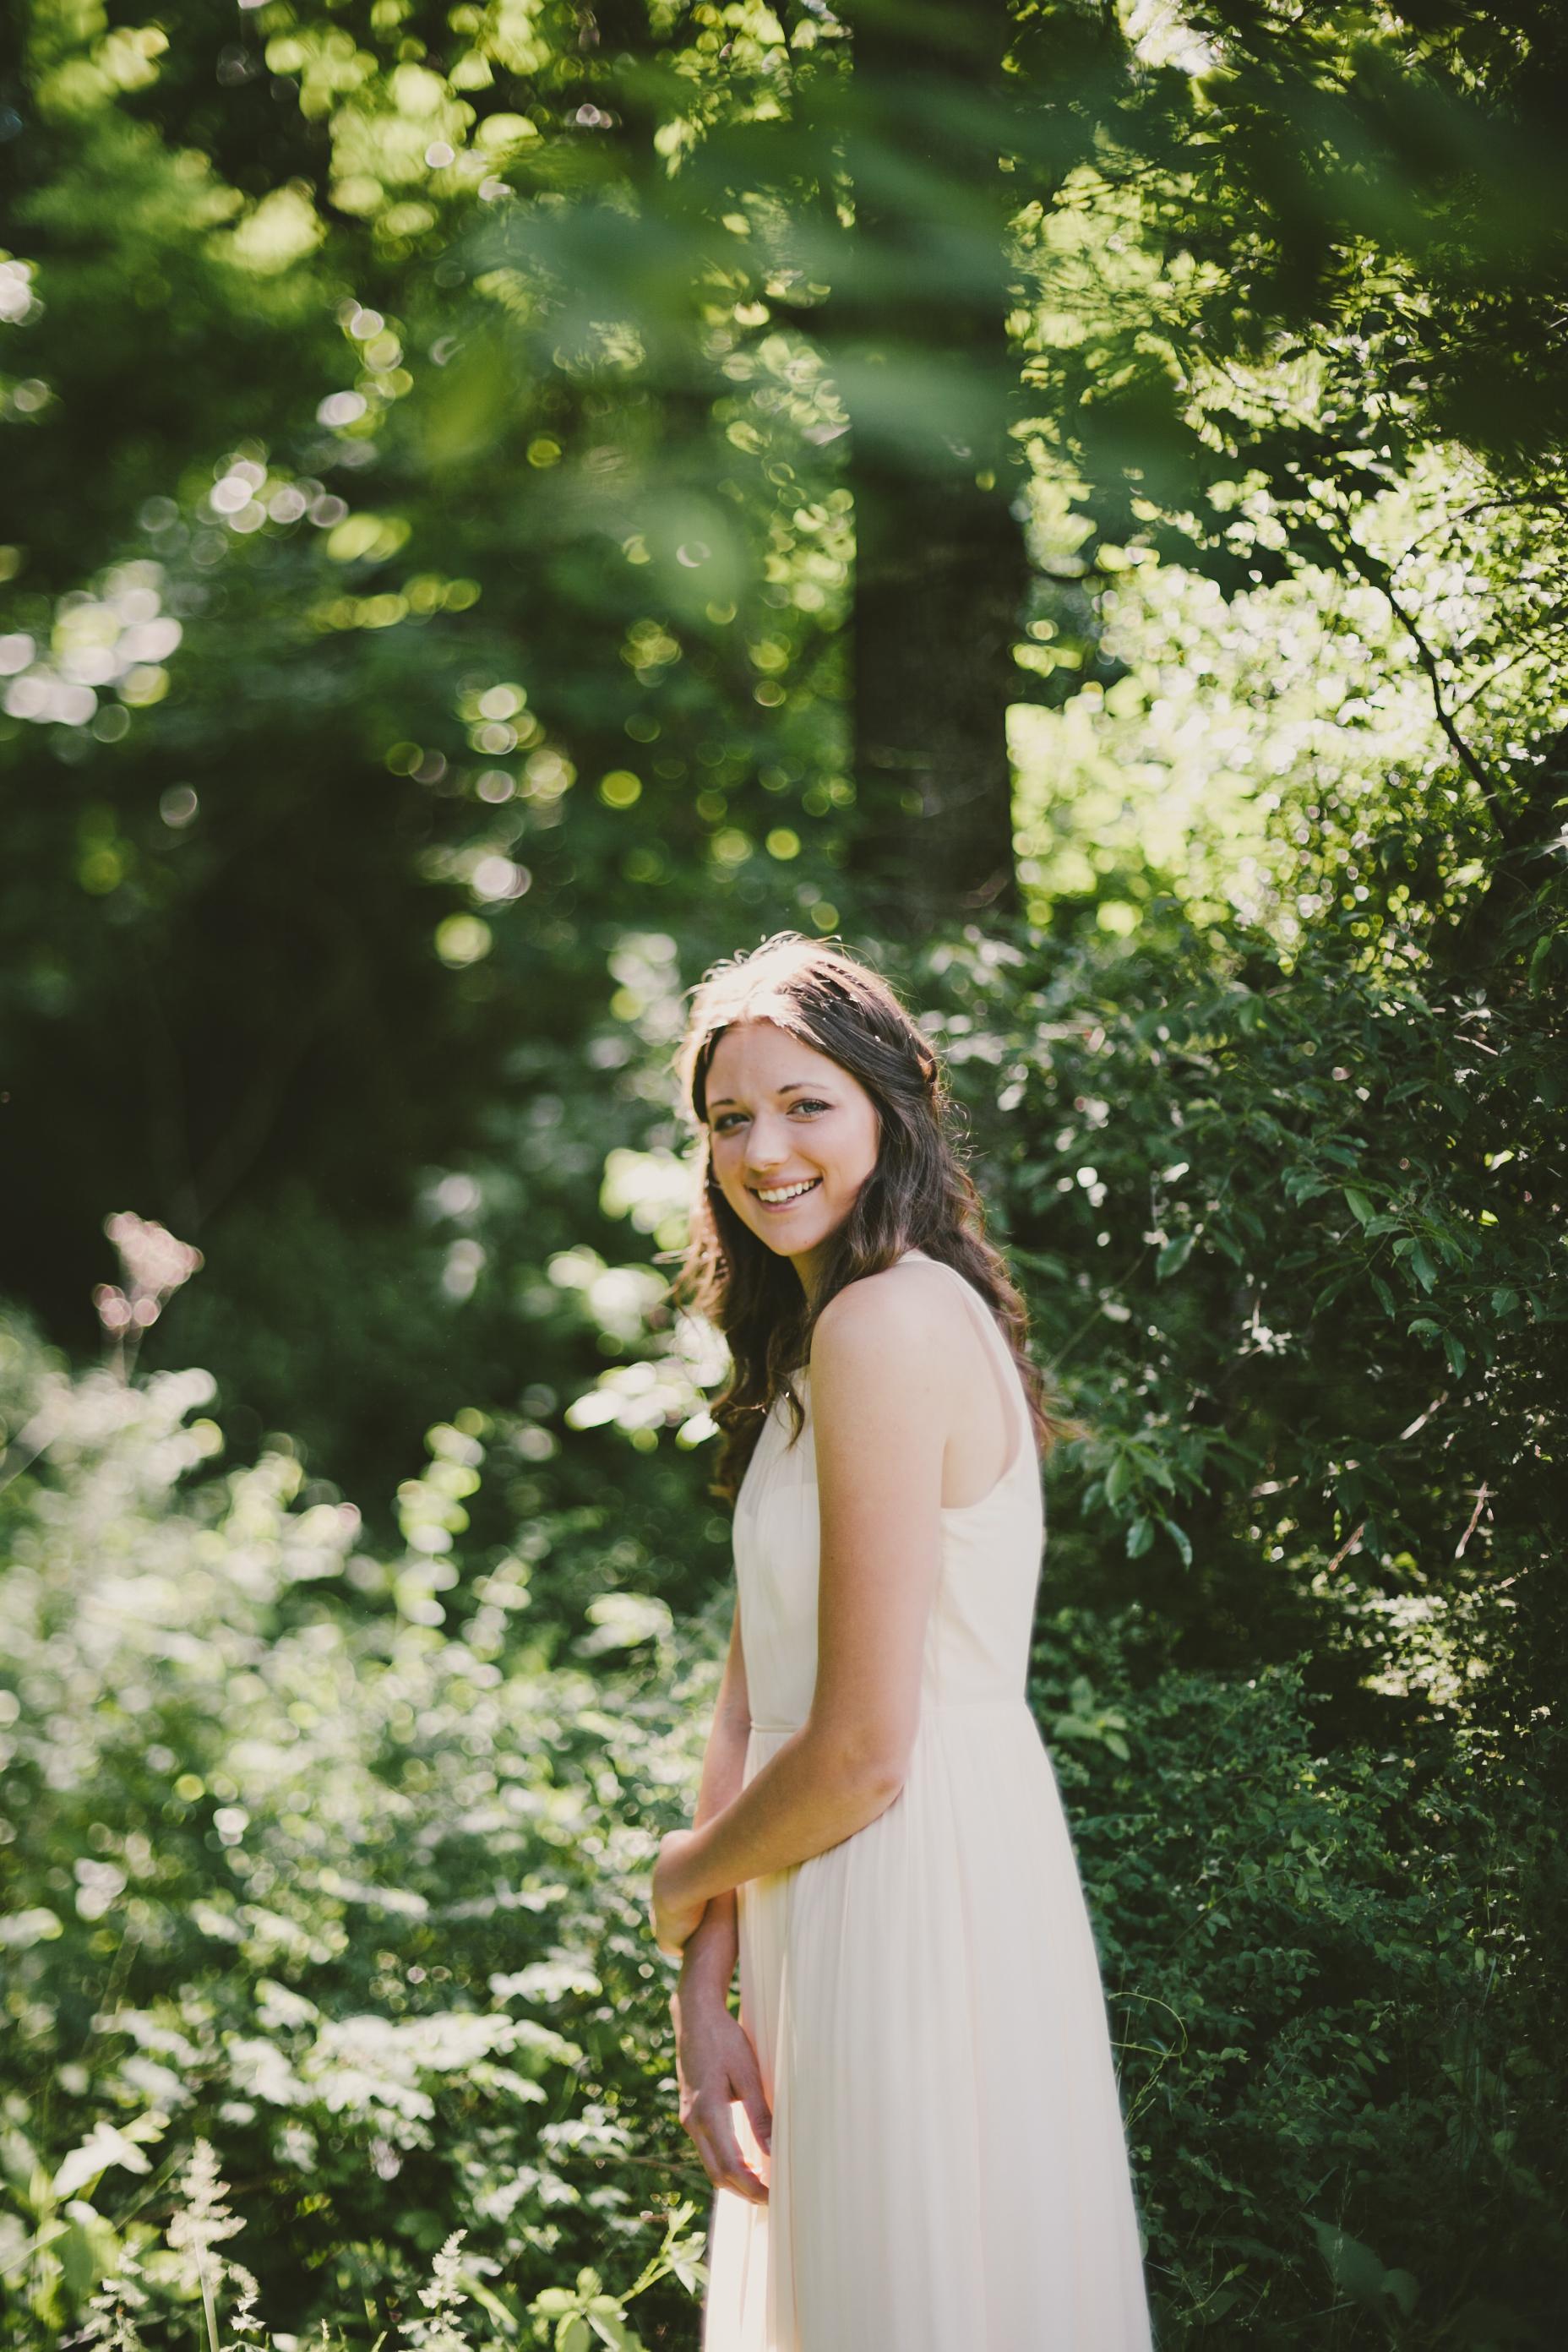 Zack + Hannah Millsaps Wedding in Greenville SC Nashville Wedding Photographer Photography Anthology-13.jpg